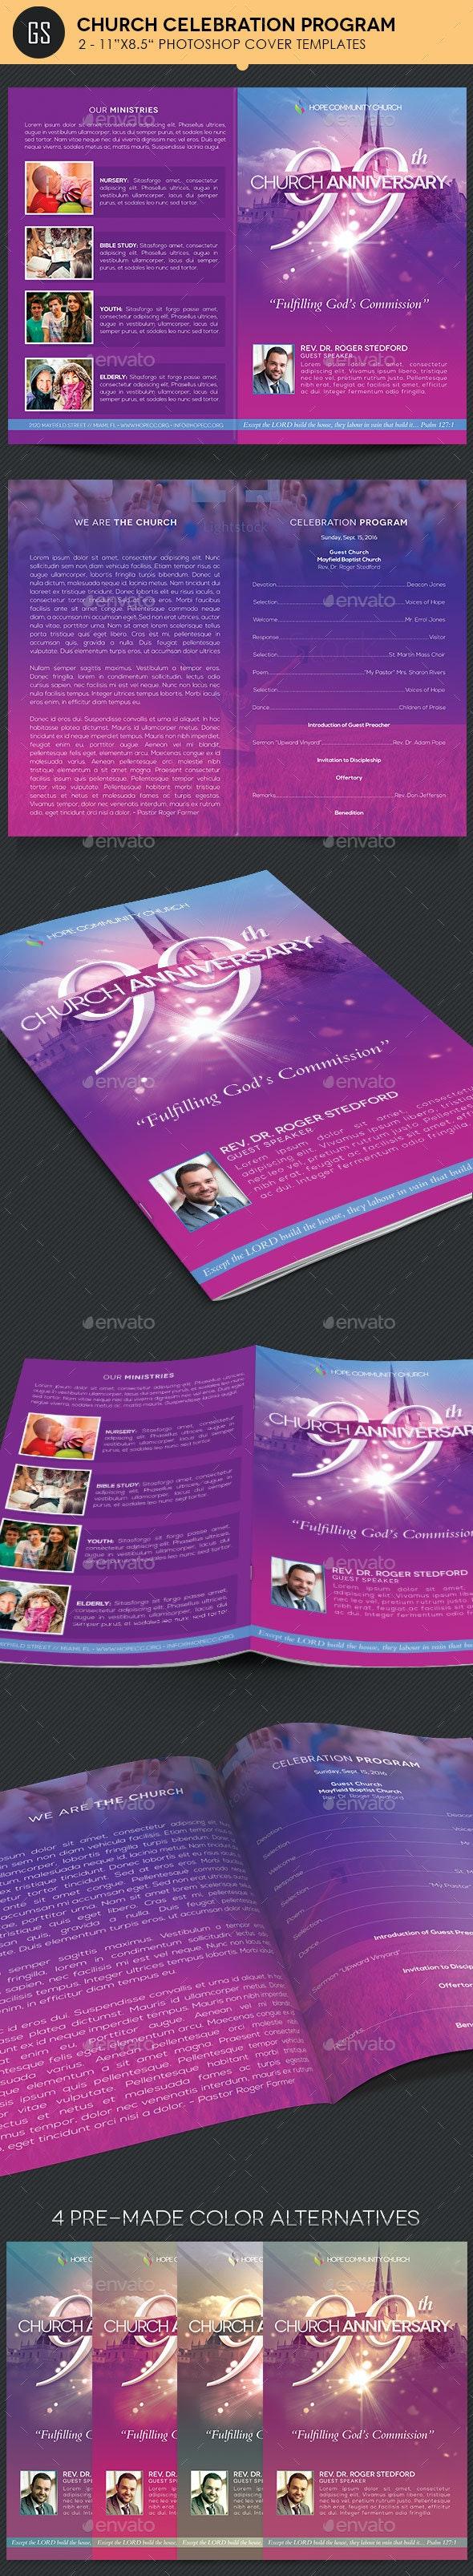 Church Celebration Program Template - Informational Brochures